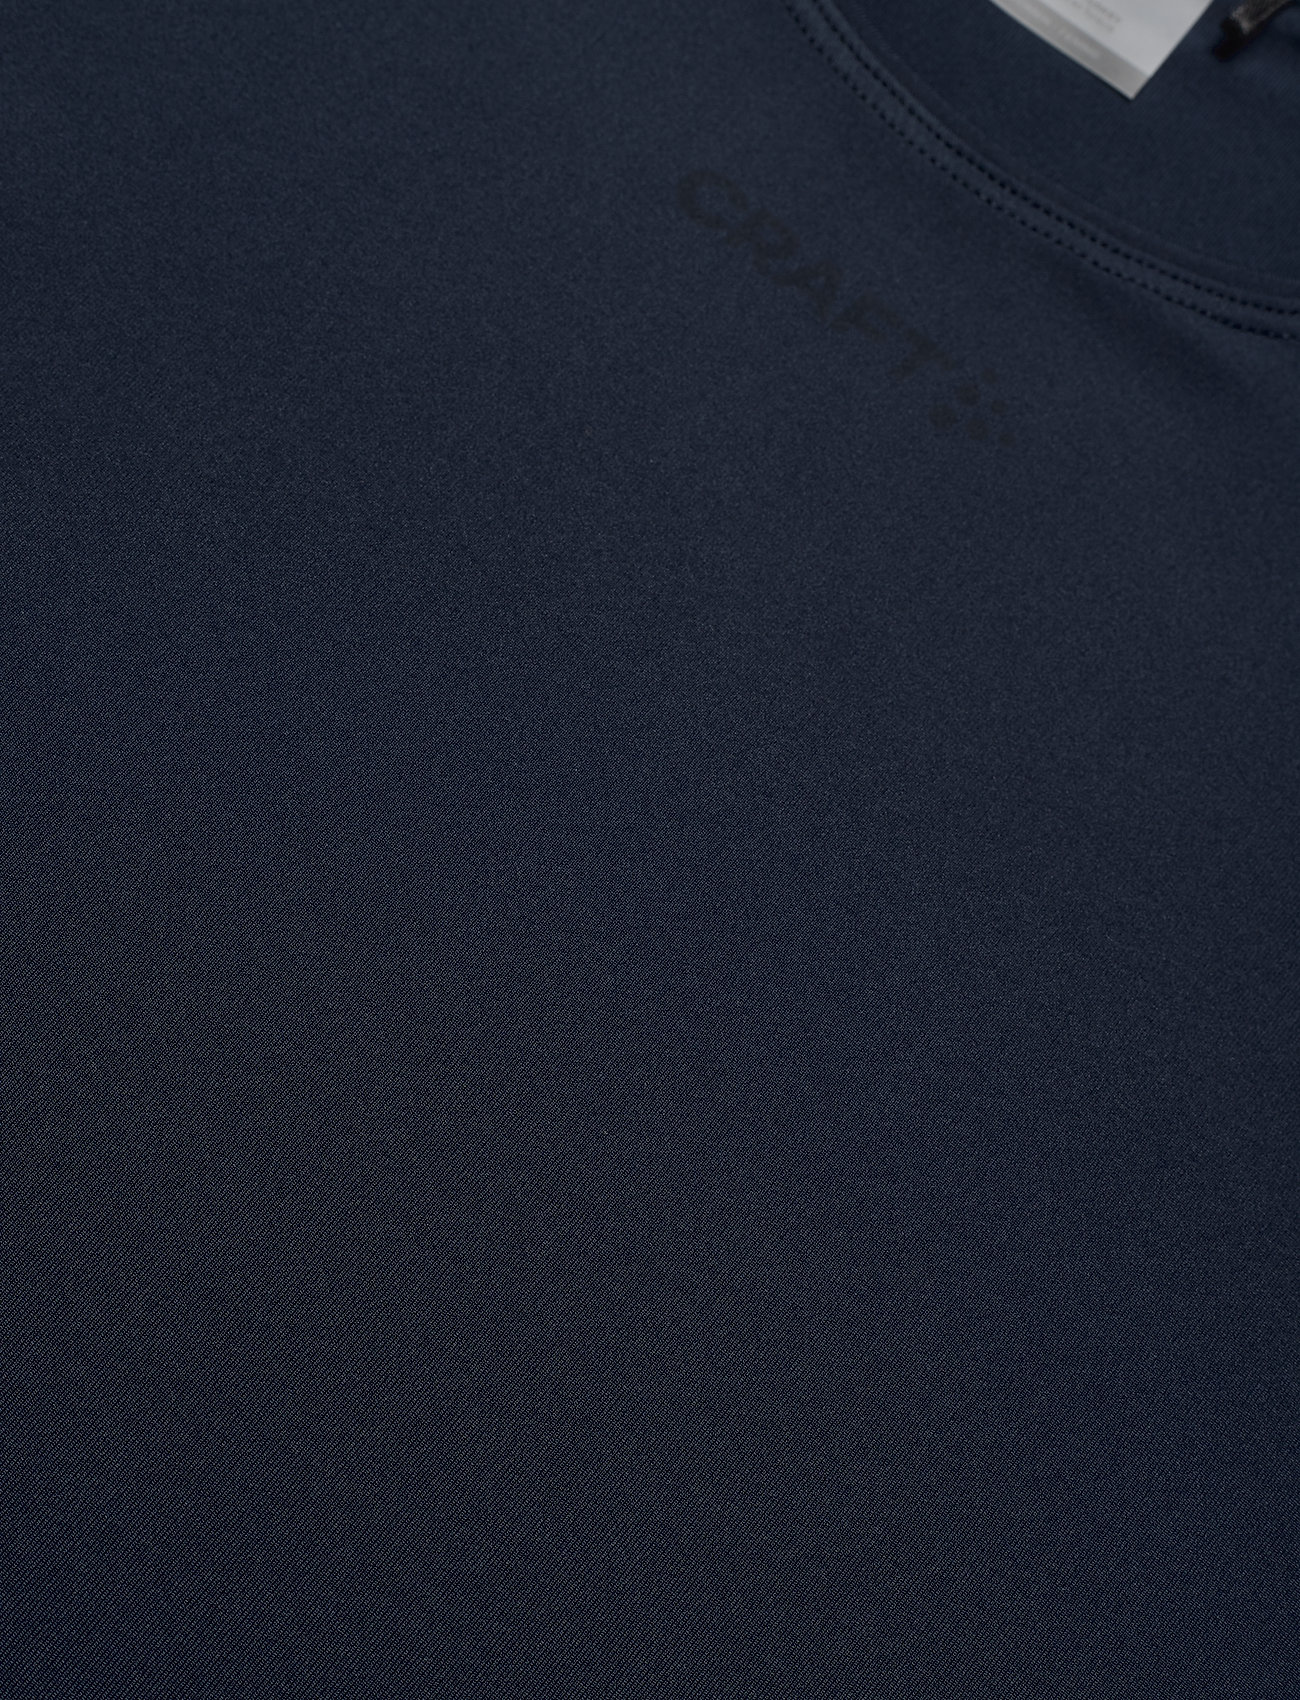 Adv Essence Ss Slim Tee W   - Craft -  Women's T-shirts & Tops Purchase